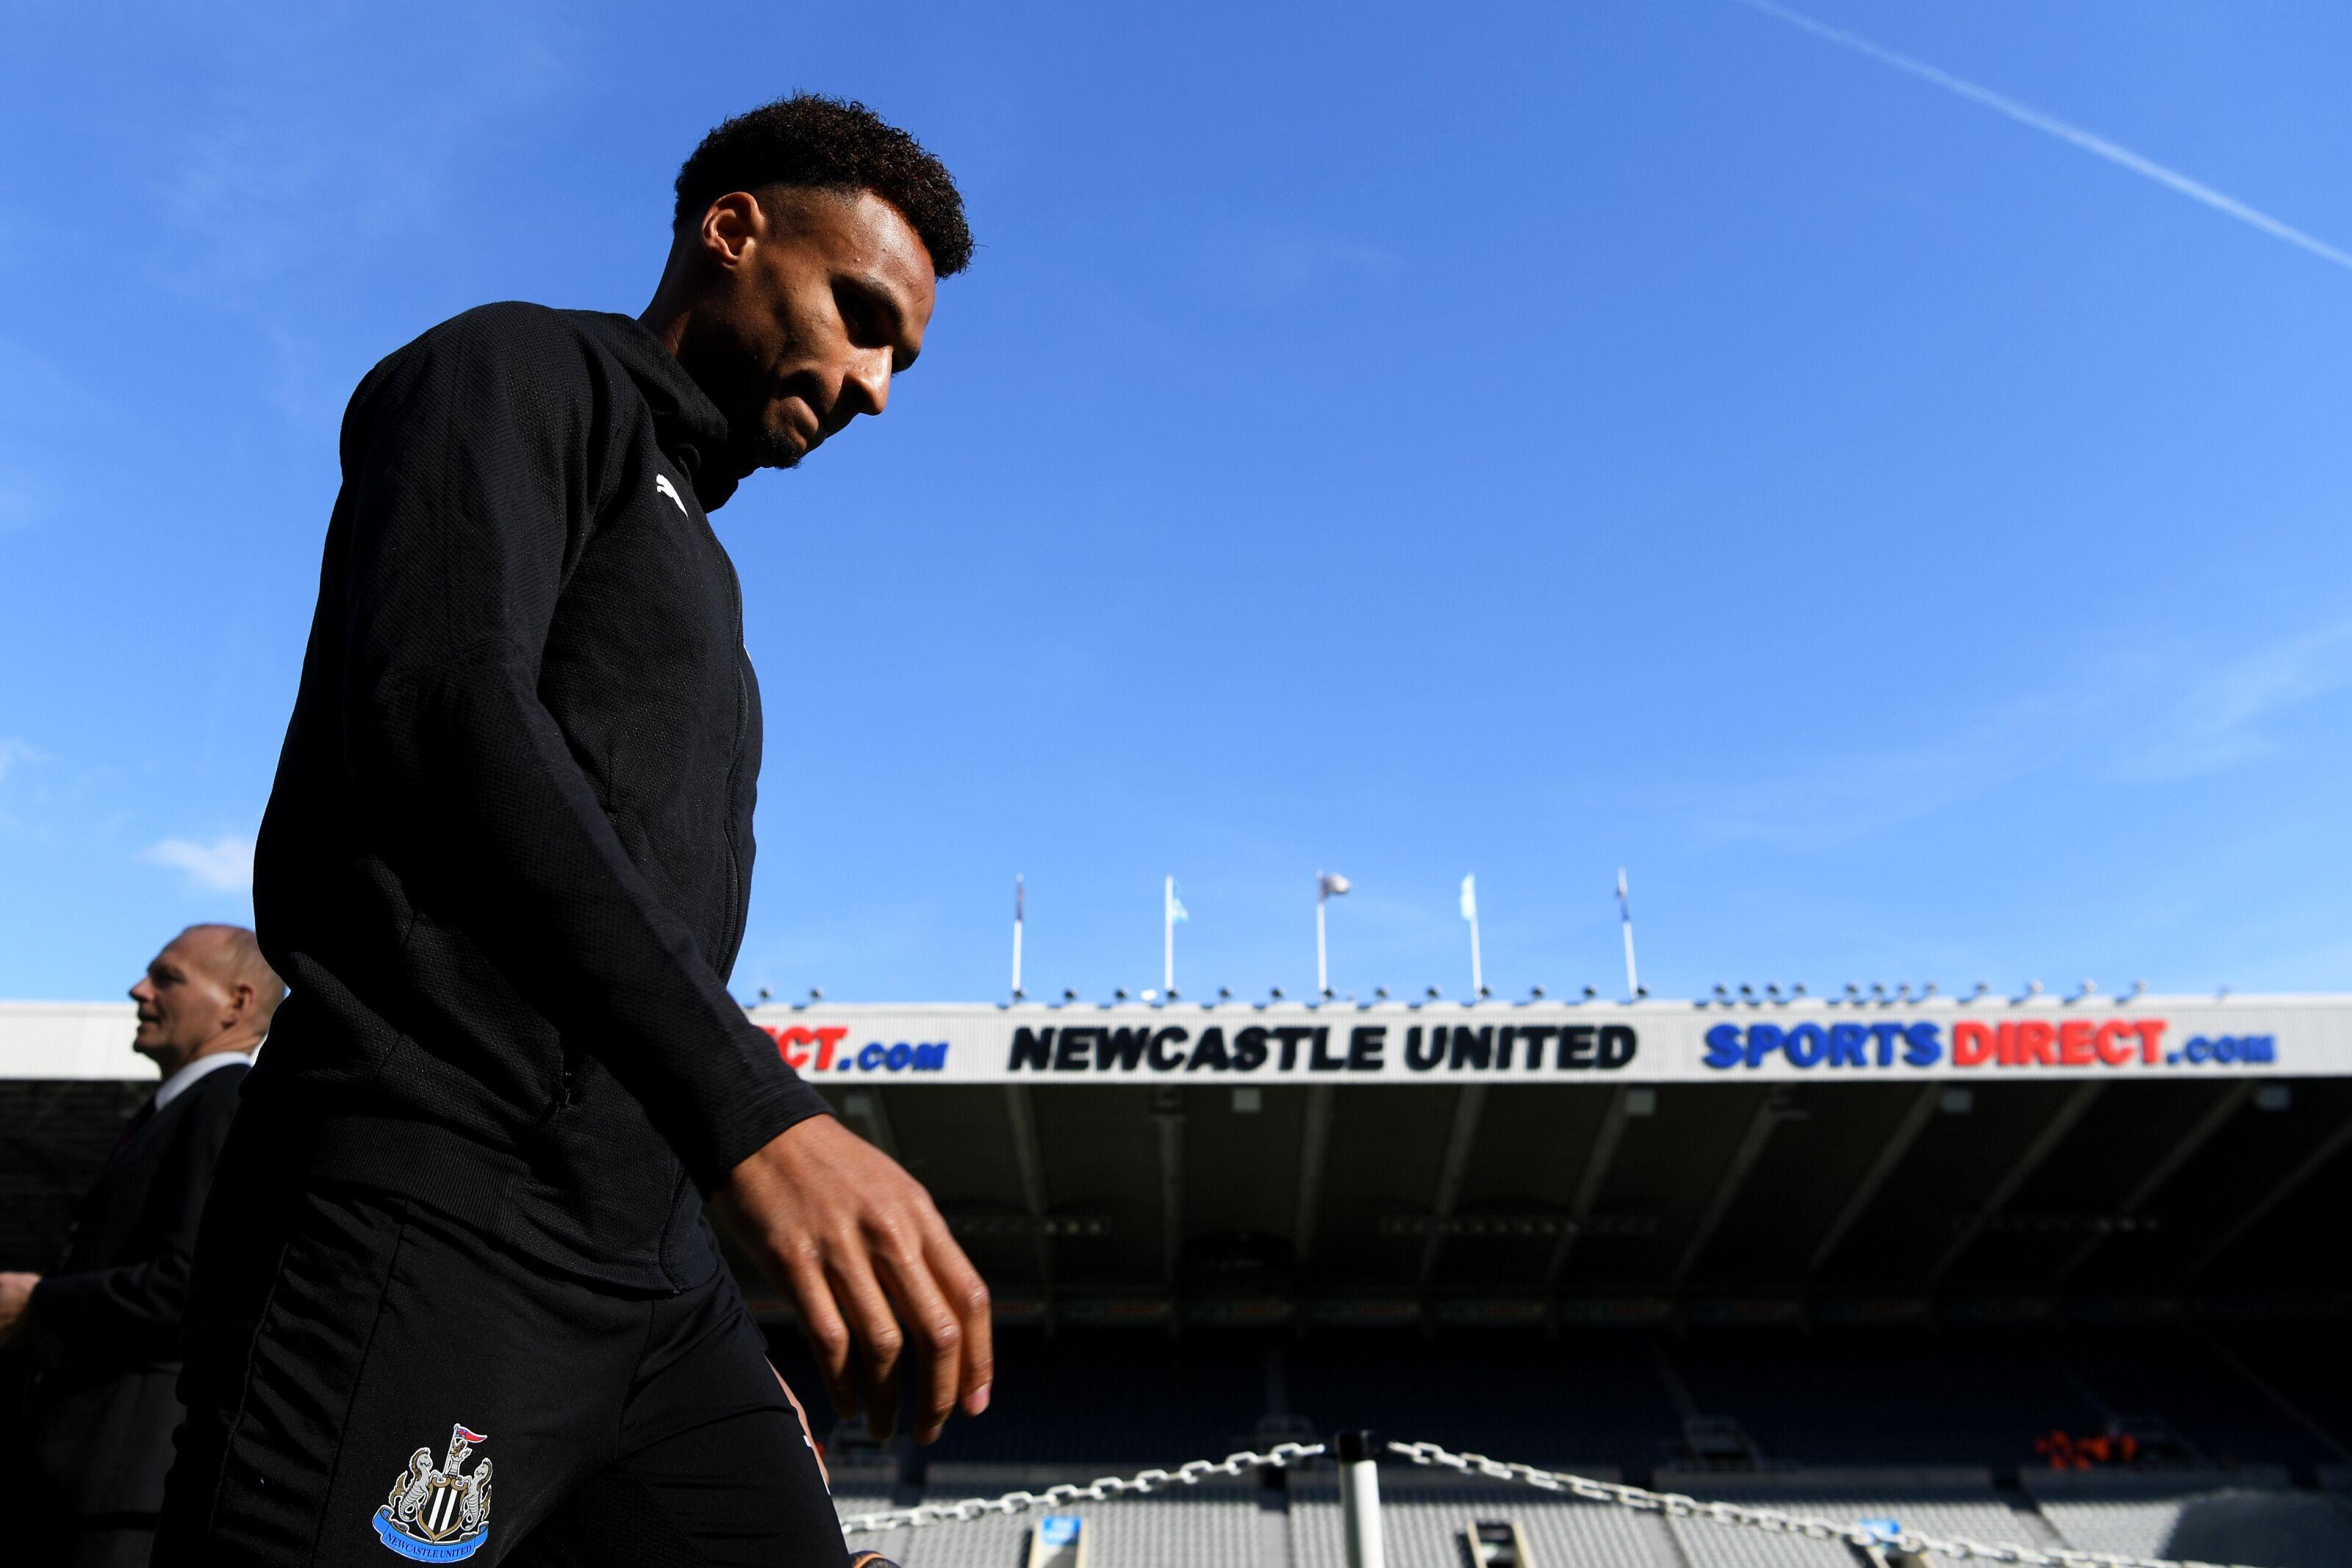 Newcastle United loanee look-in: 8/17/19